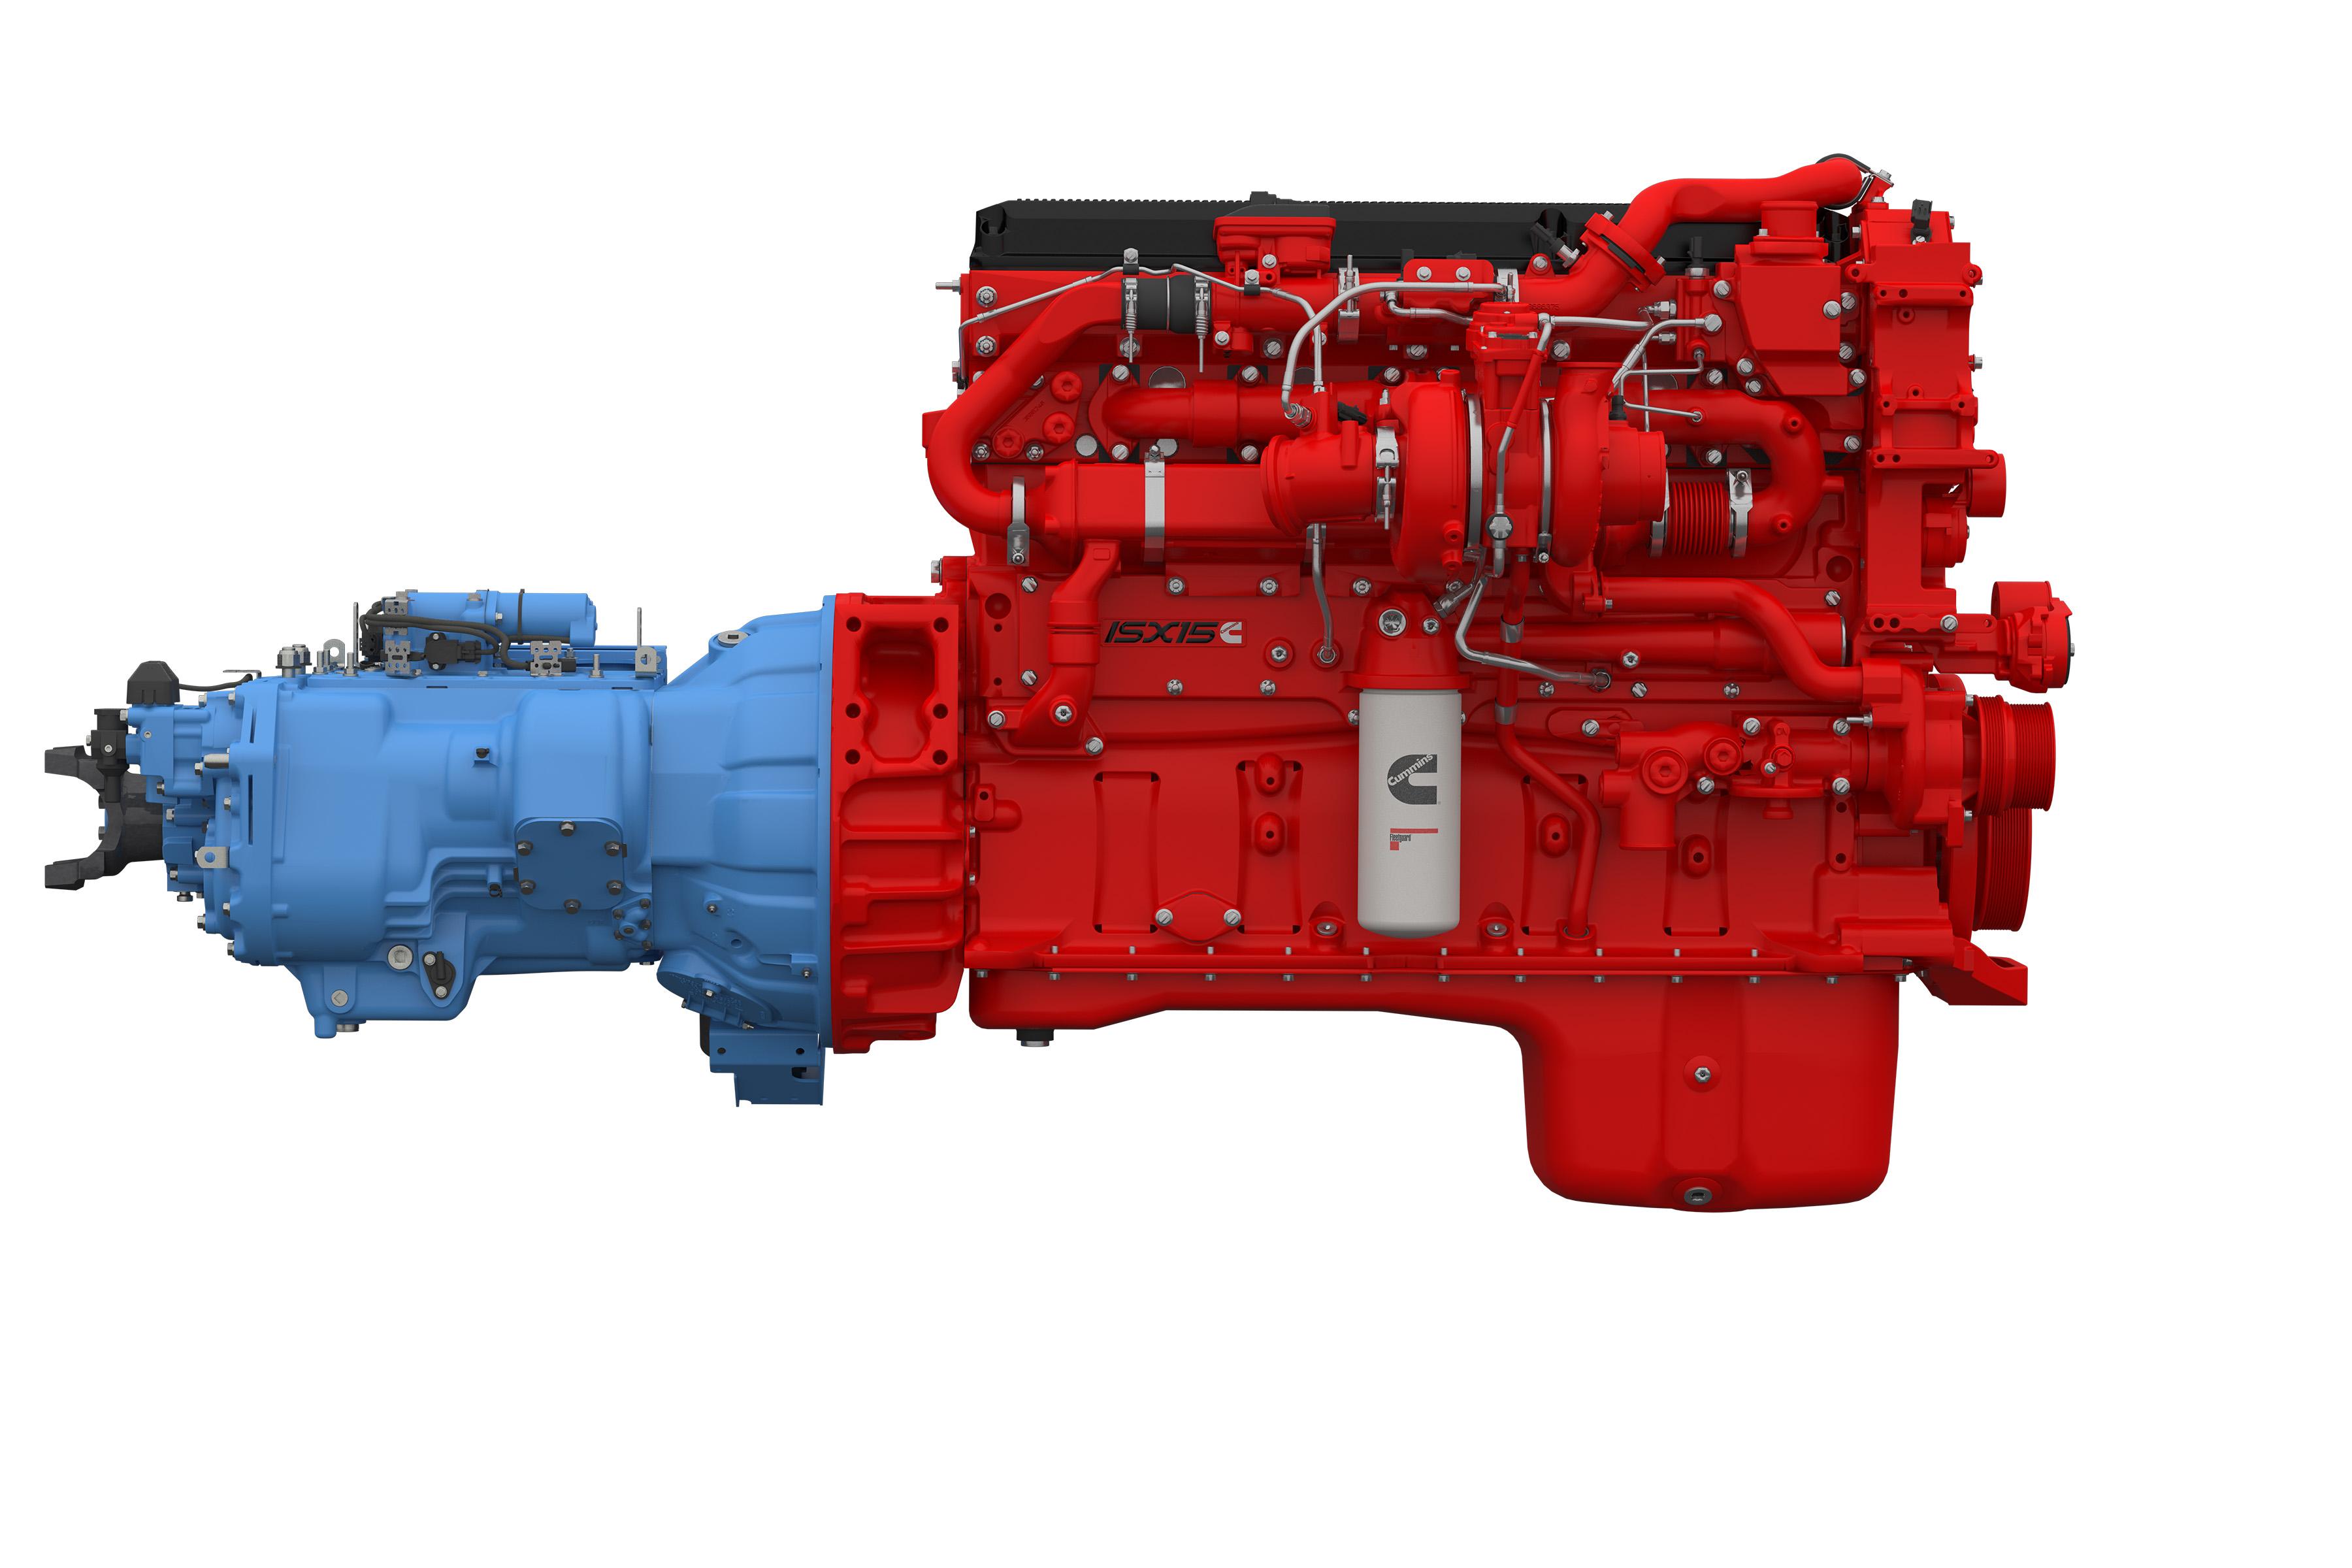 Cummins Showcases 2013 Engines, New Features